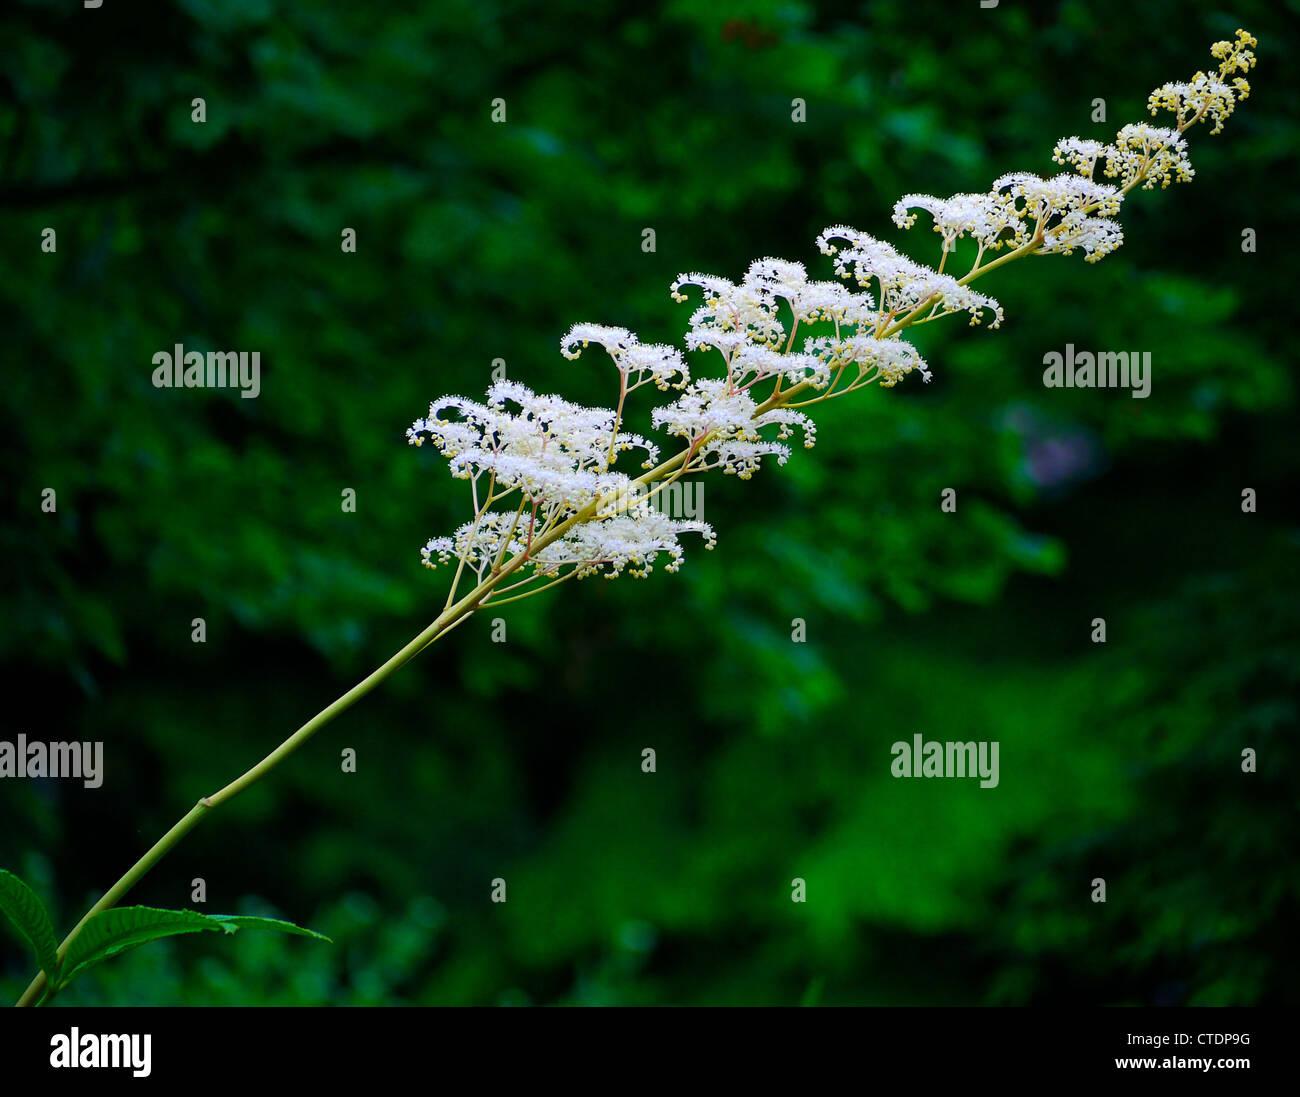 Single stem of tiny white feather like flowers surrounded by green single stem of tiny white feather like flowers surrounded by green foliage mightylinksfo